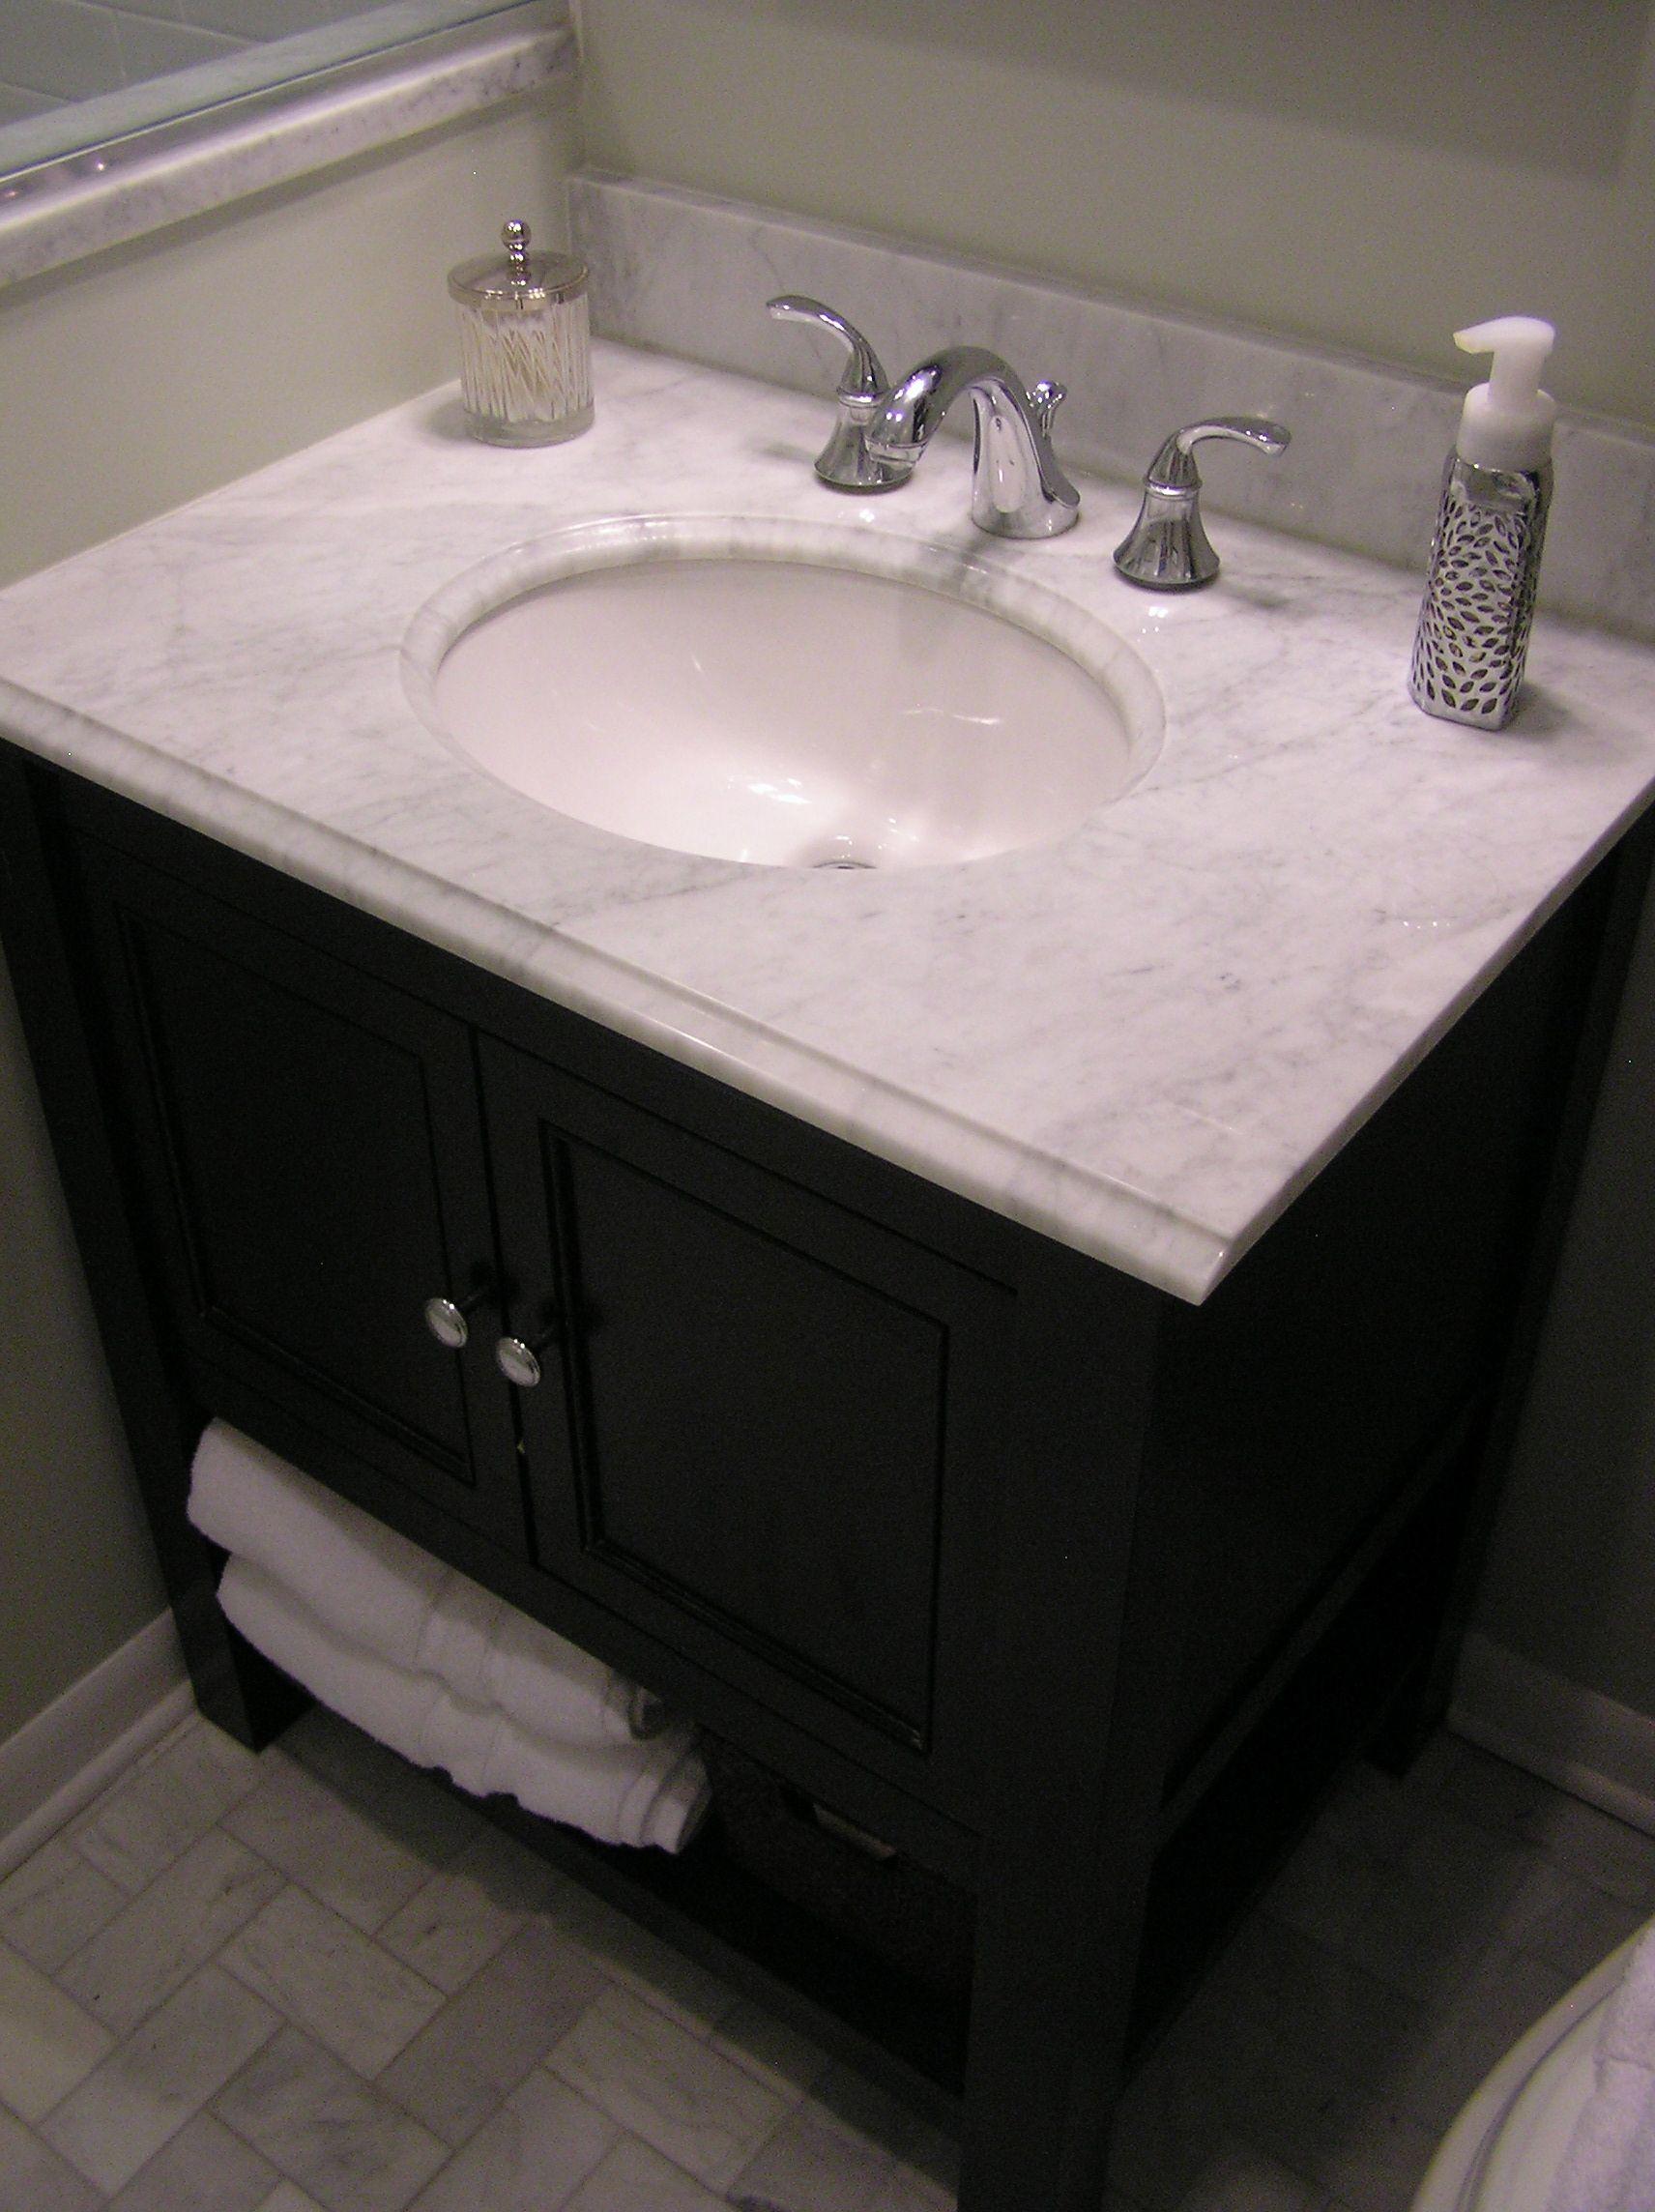 19 Amazing Costco Bathroom Vanities Bathroom Vanity Small Bathroom Vanities Vanity